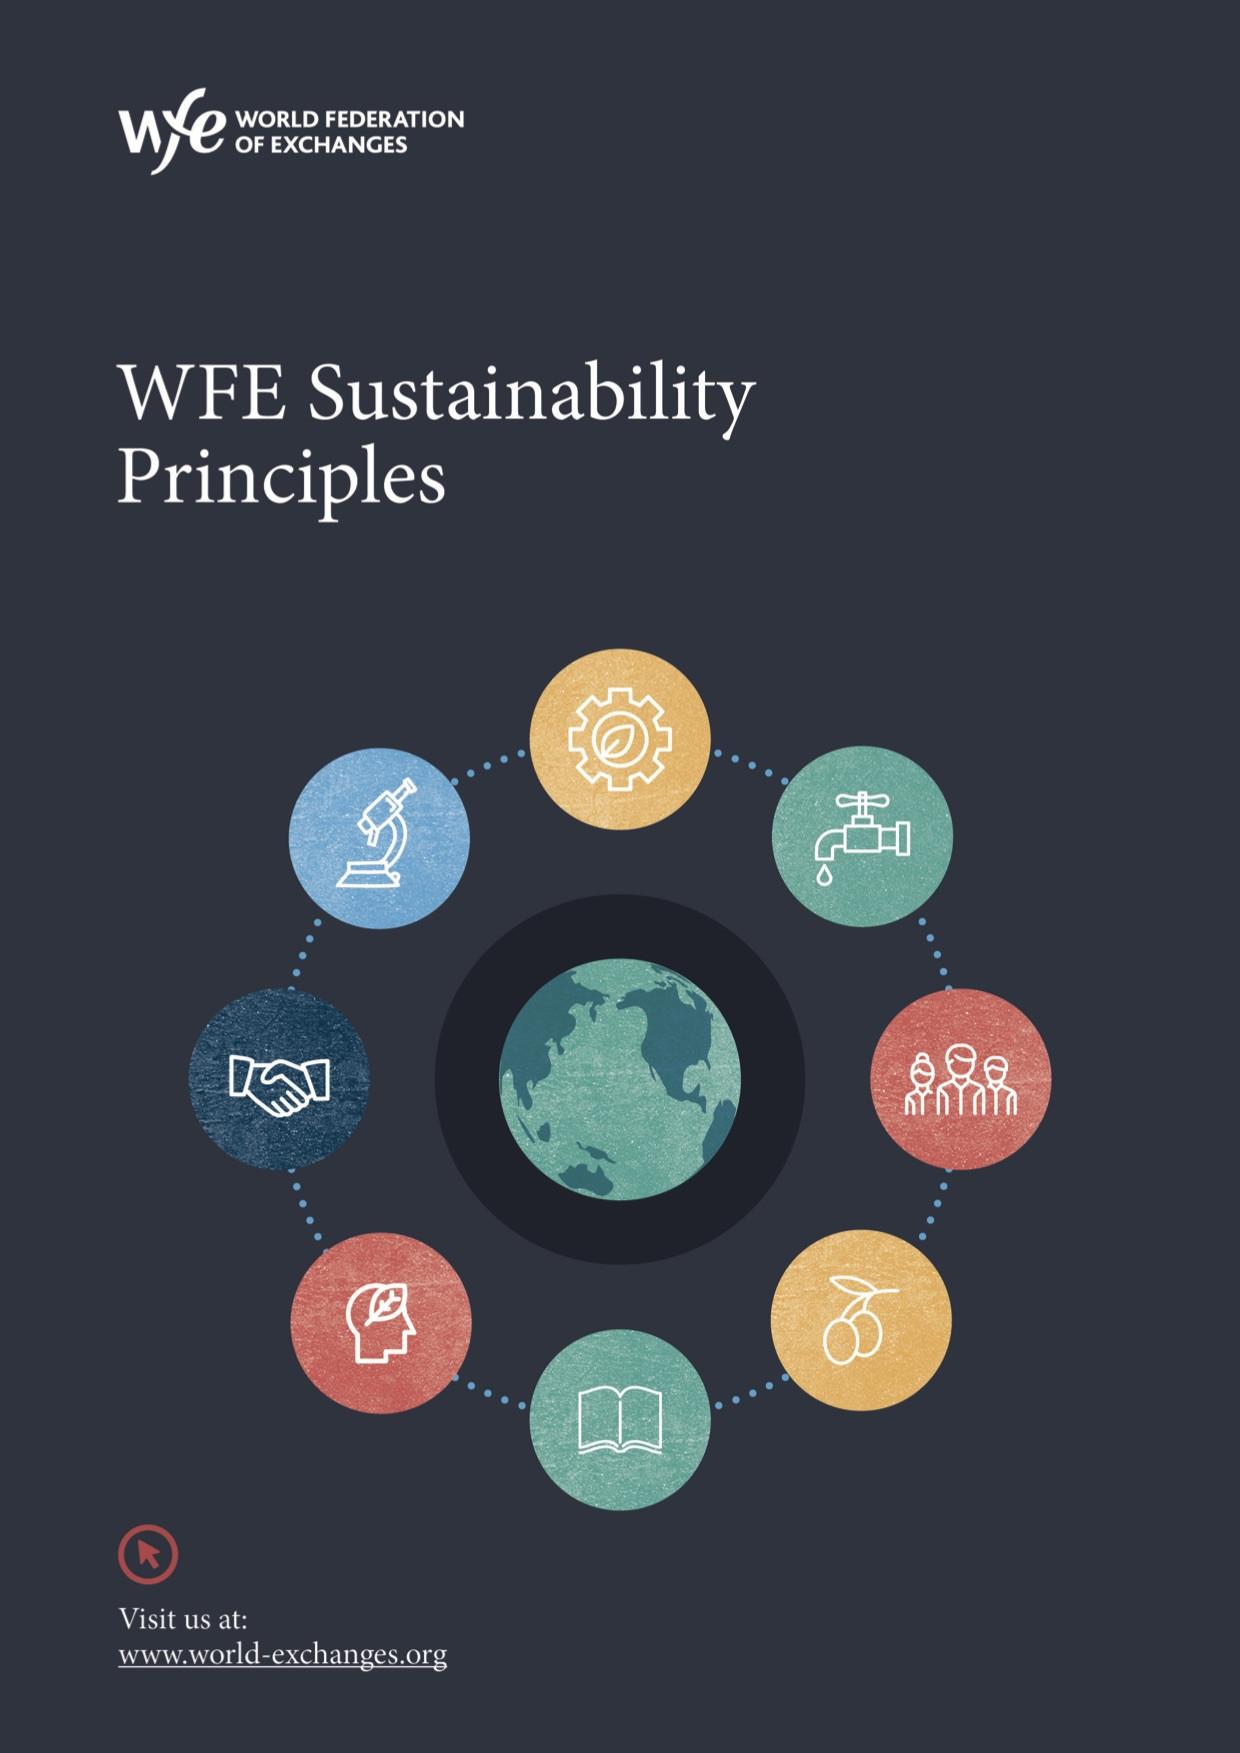 WFE Sustainability Principles